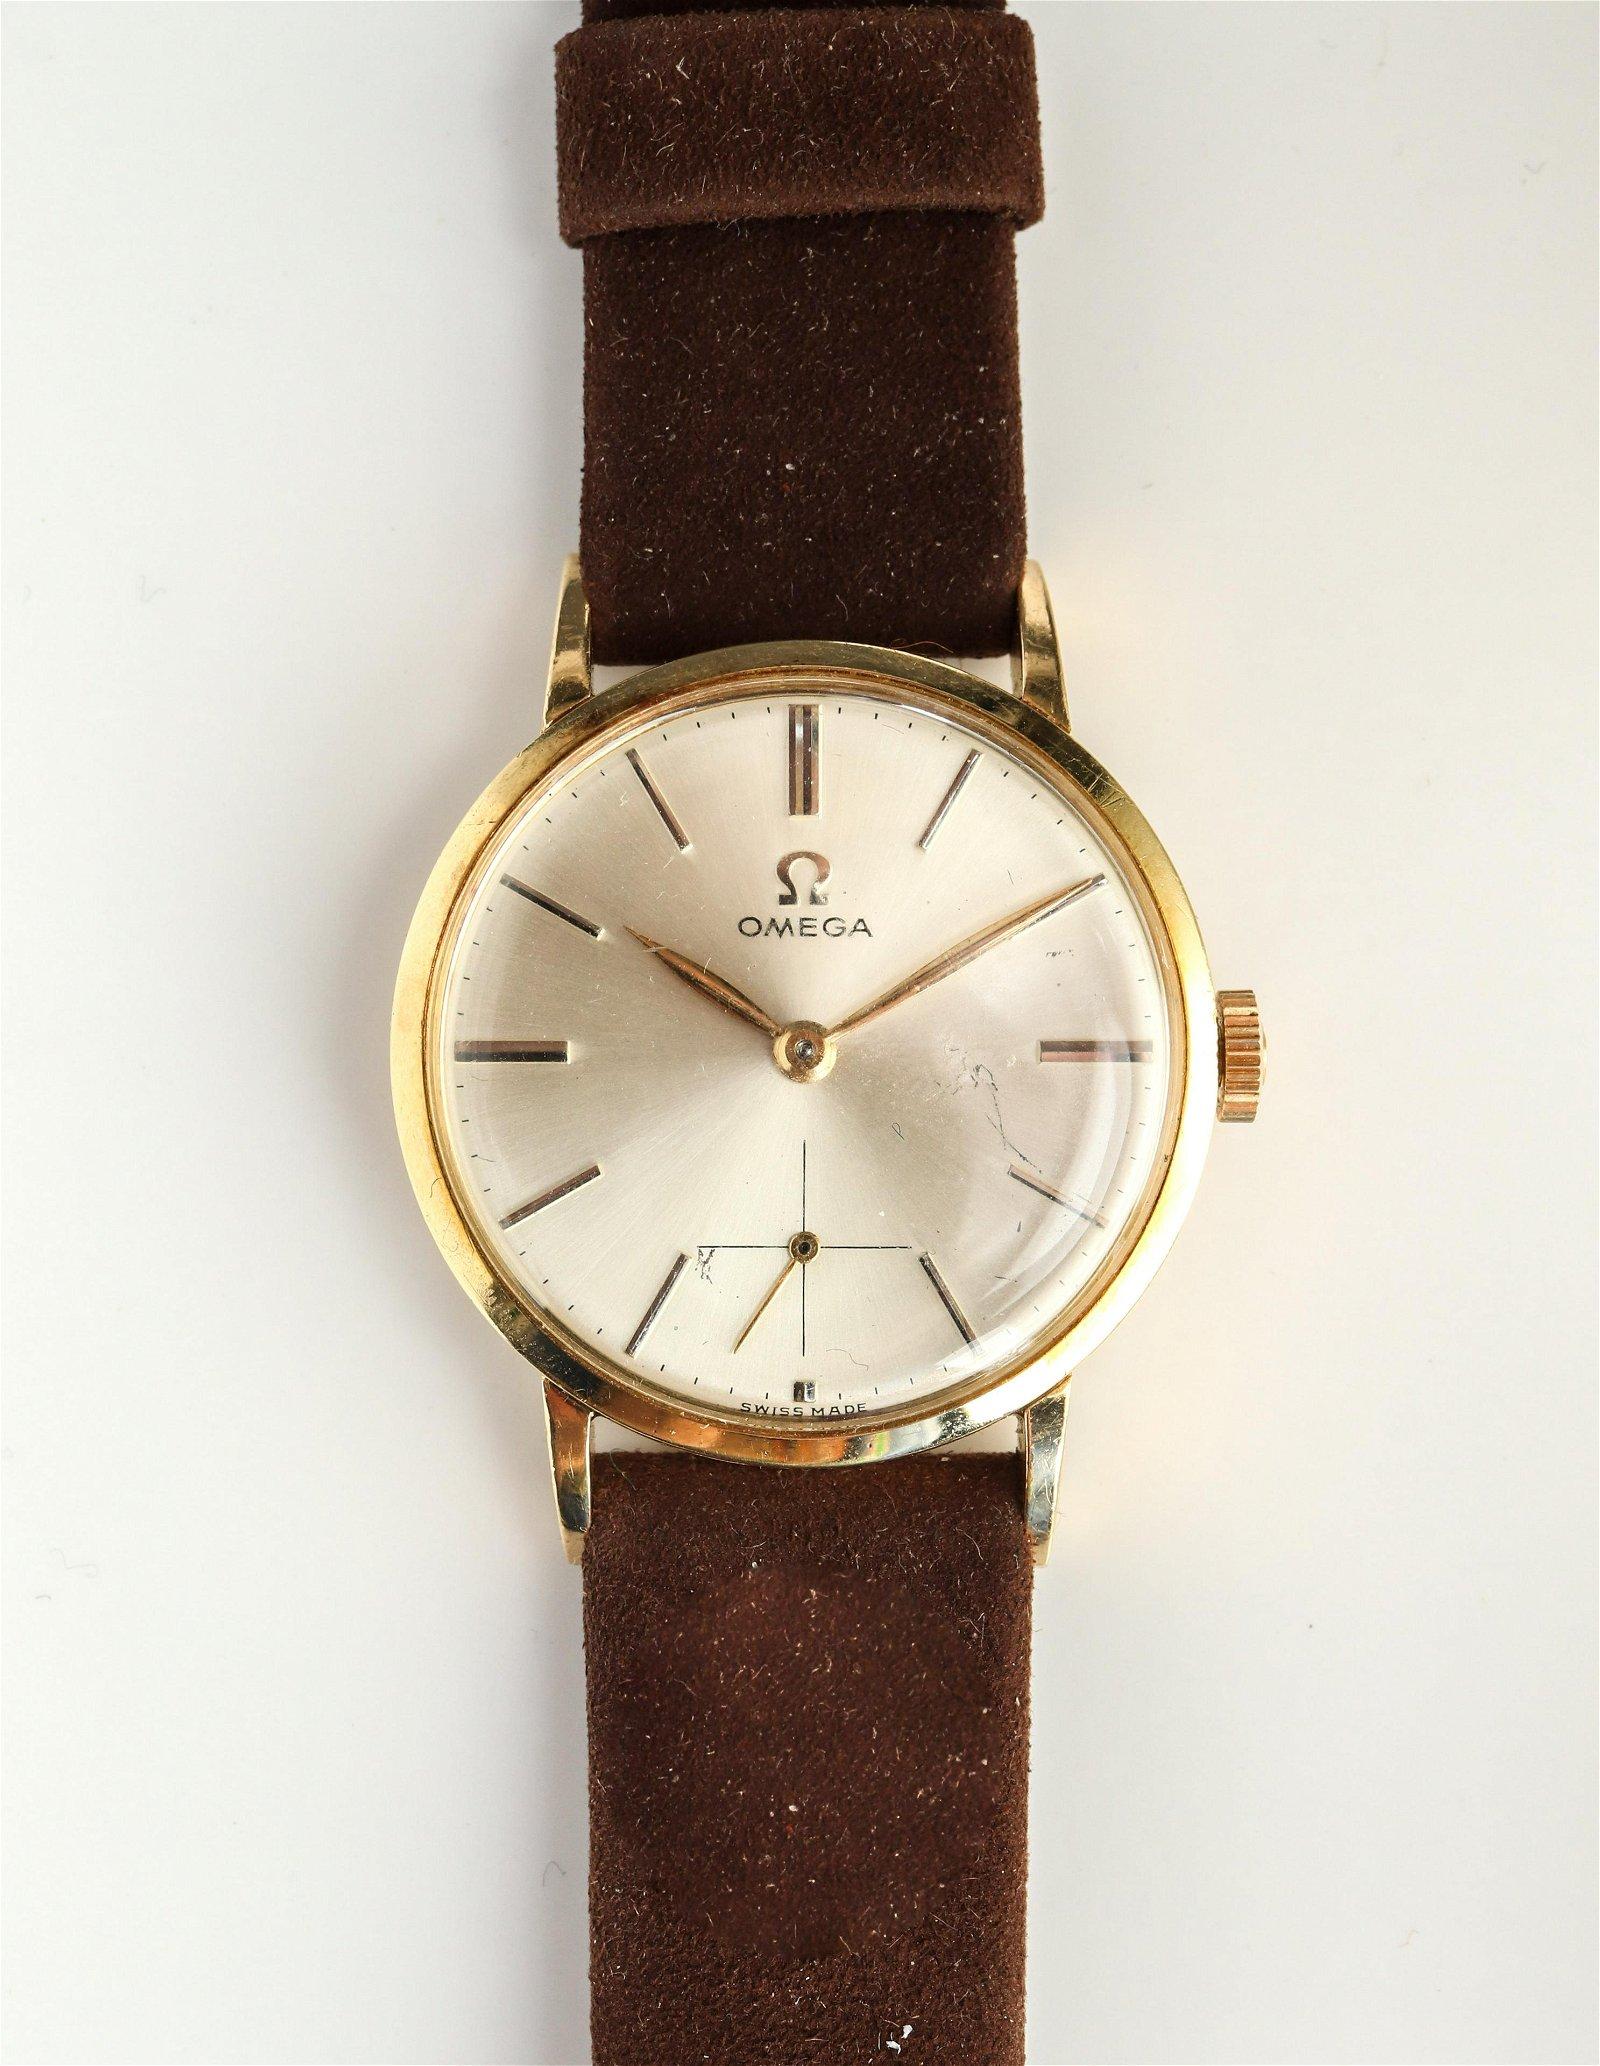 Omega 18K Yellow Gold Gentleman's Wristwatch